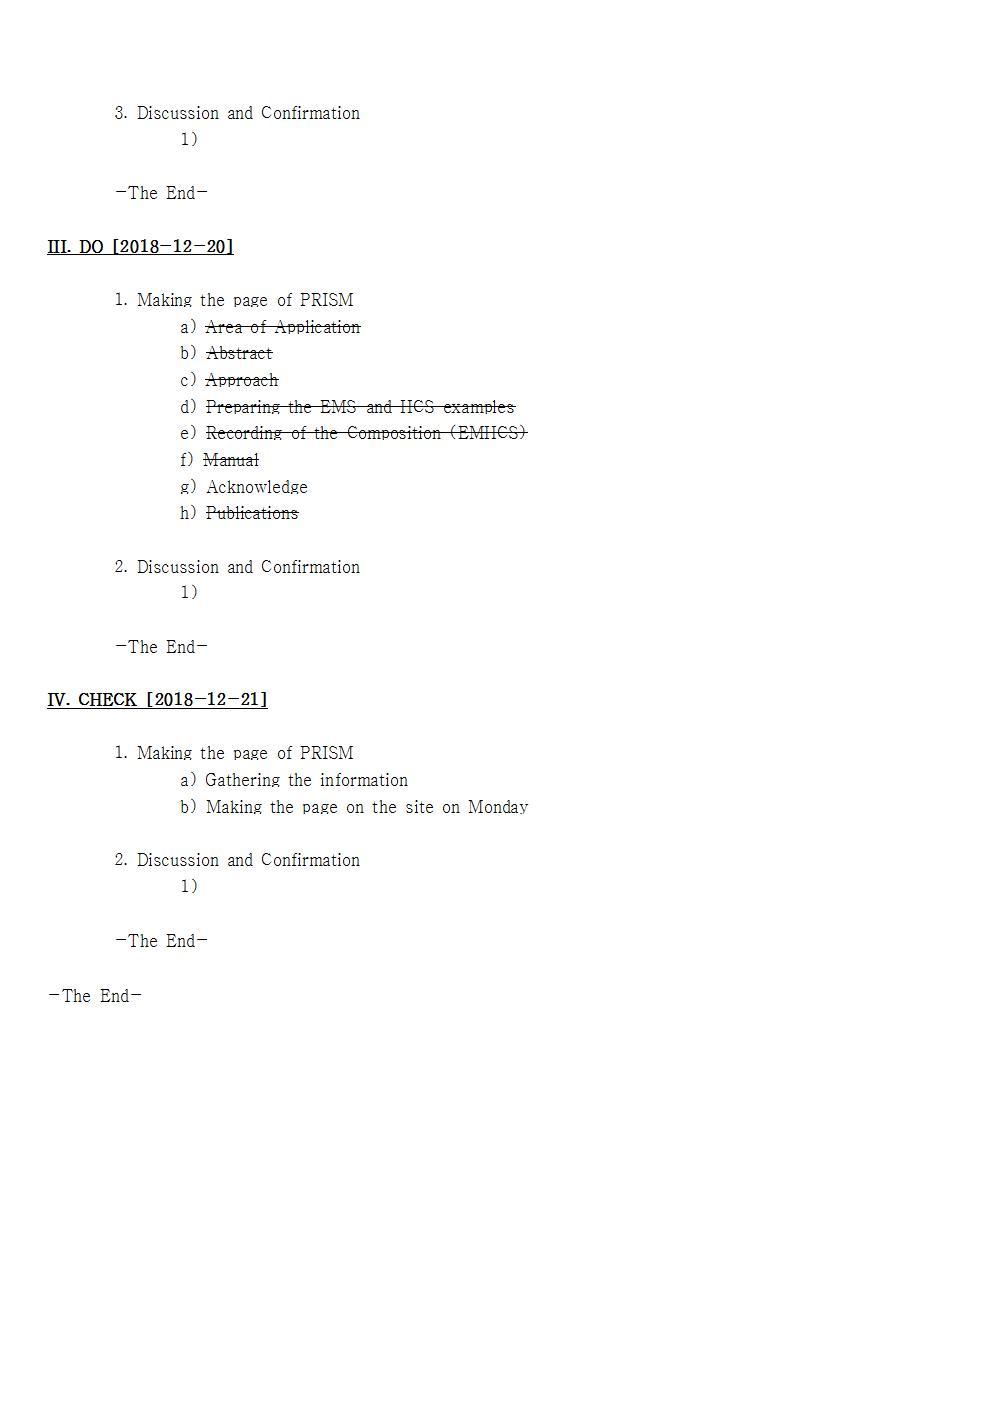 D-[18-002-RD-02]-[PRISM3.0-ADOxx]-[2018-12-21]-[MR]002.jpg